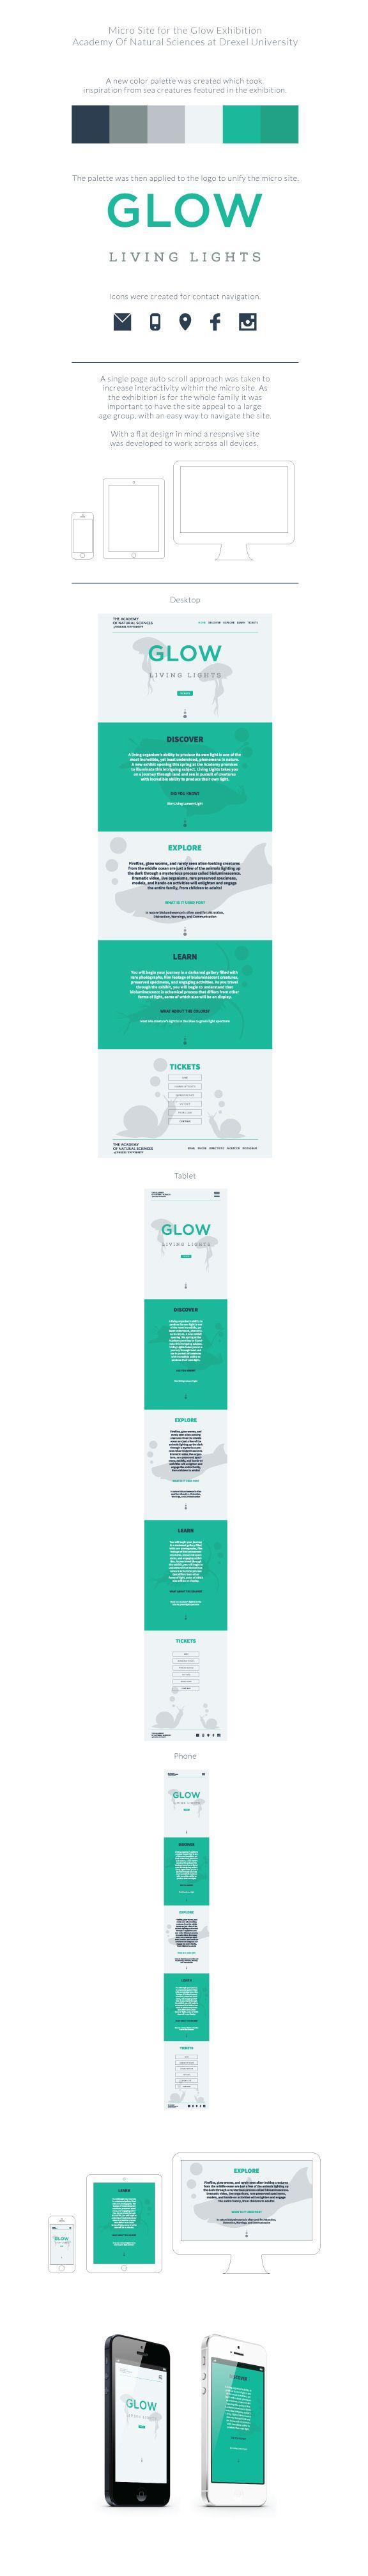 Glow Exhibition Micro Site by Mike Garzarelli, via Behance